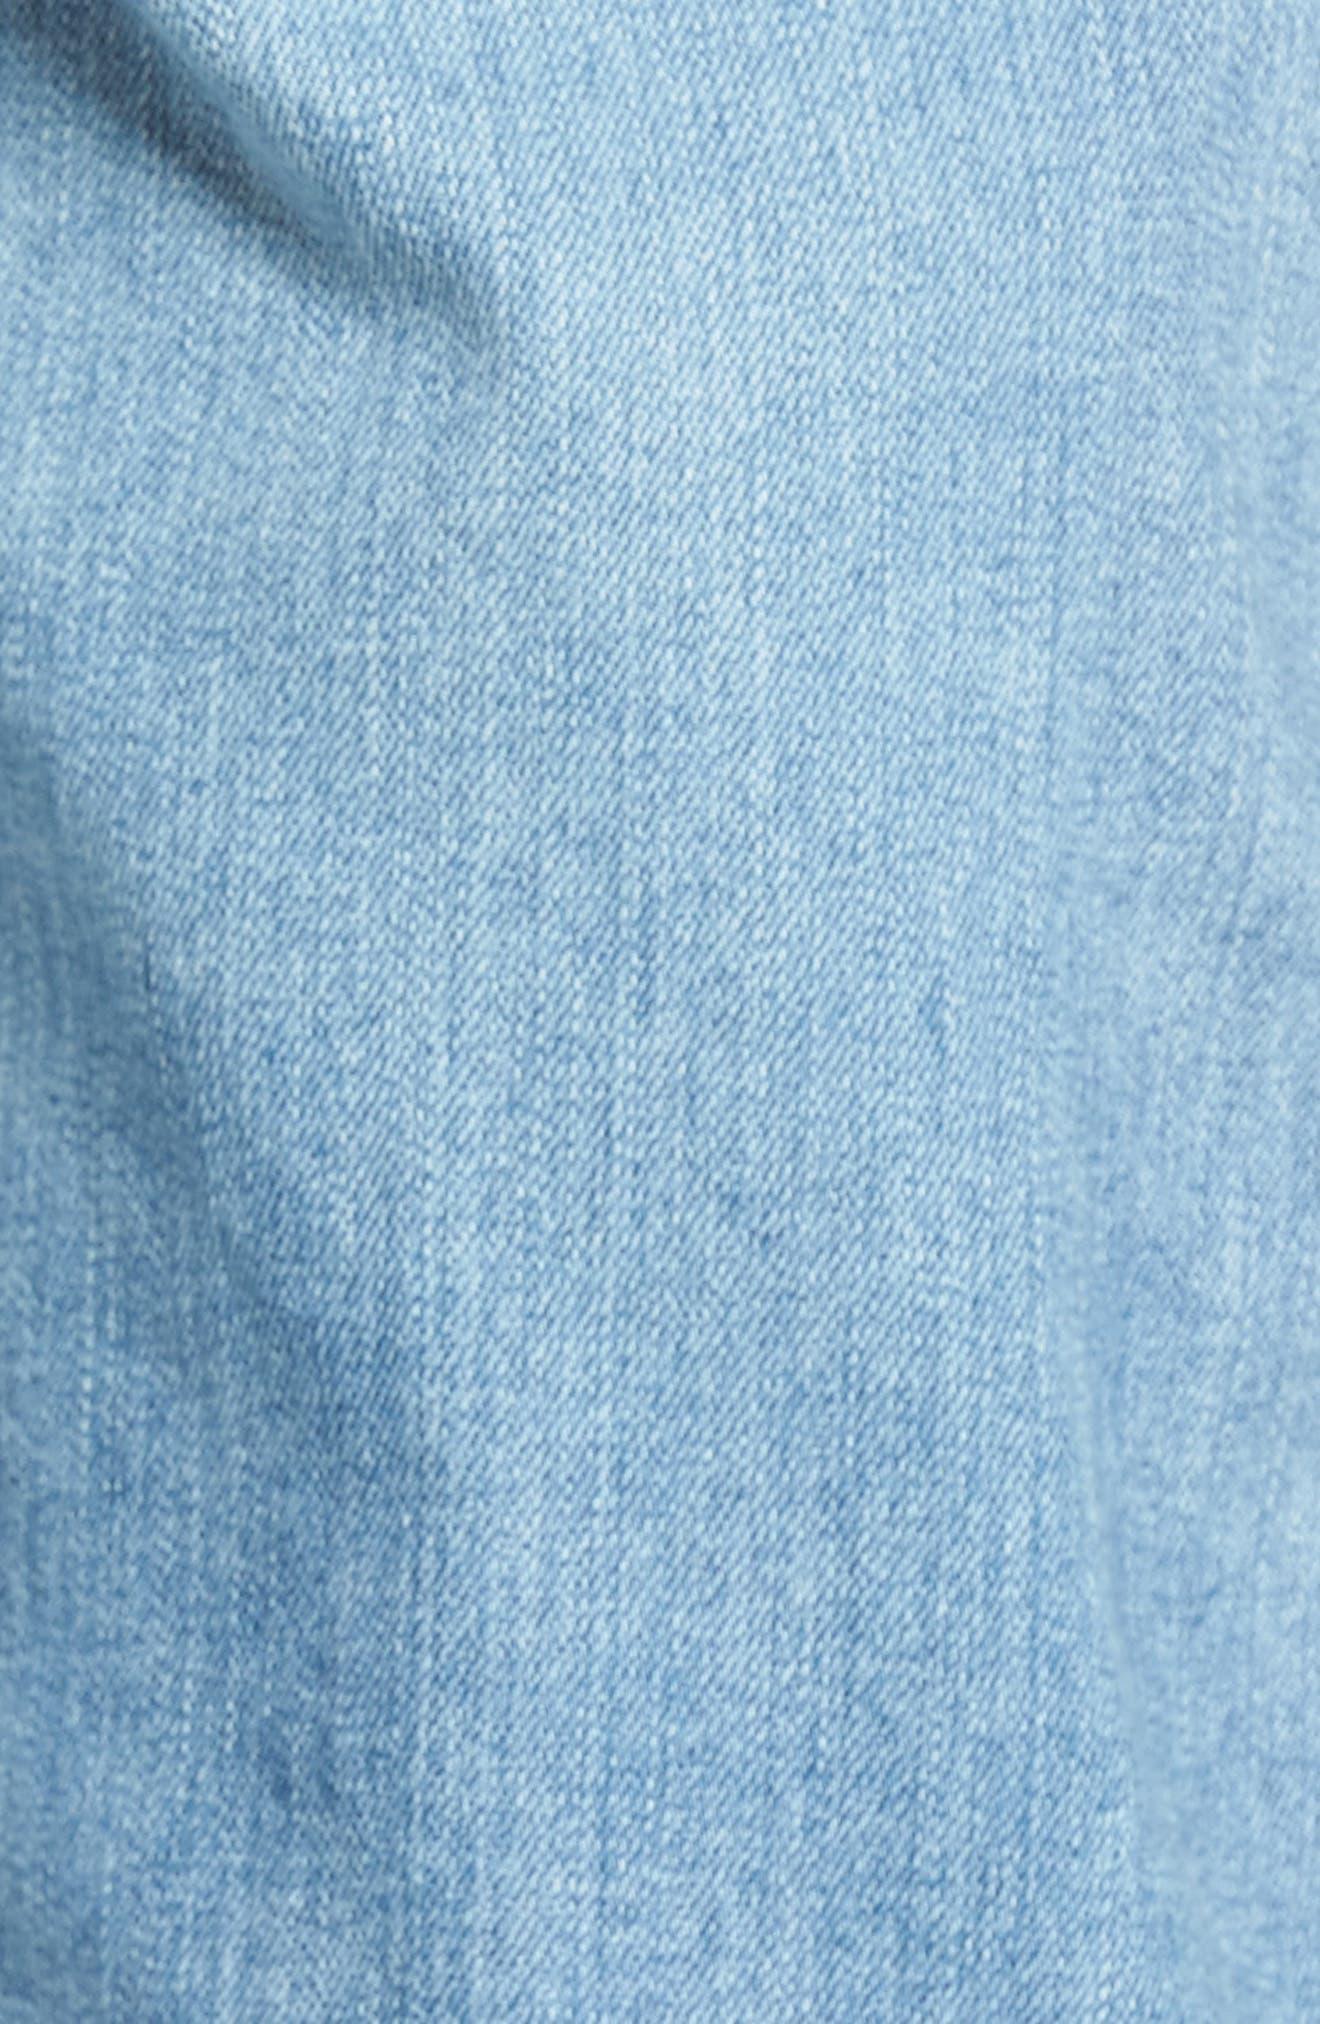 Tellis Slim Fit Jeans,                             Alternate thumbnail 5, color,                             412